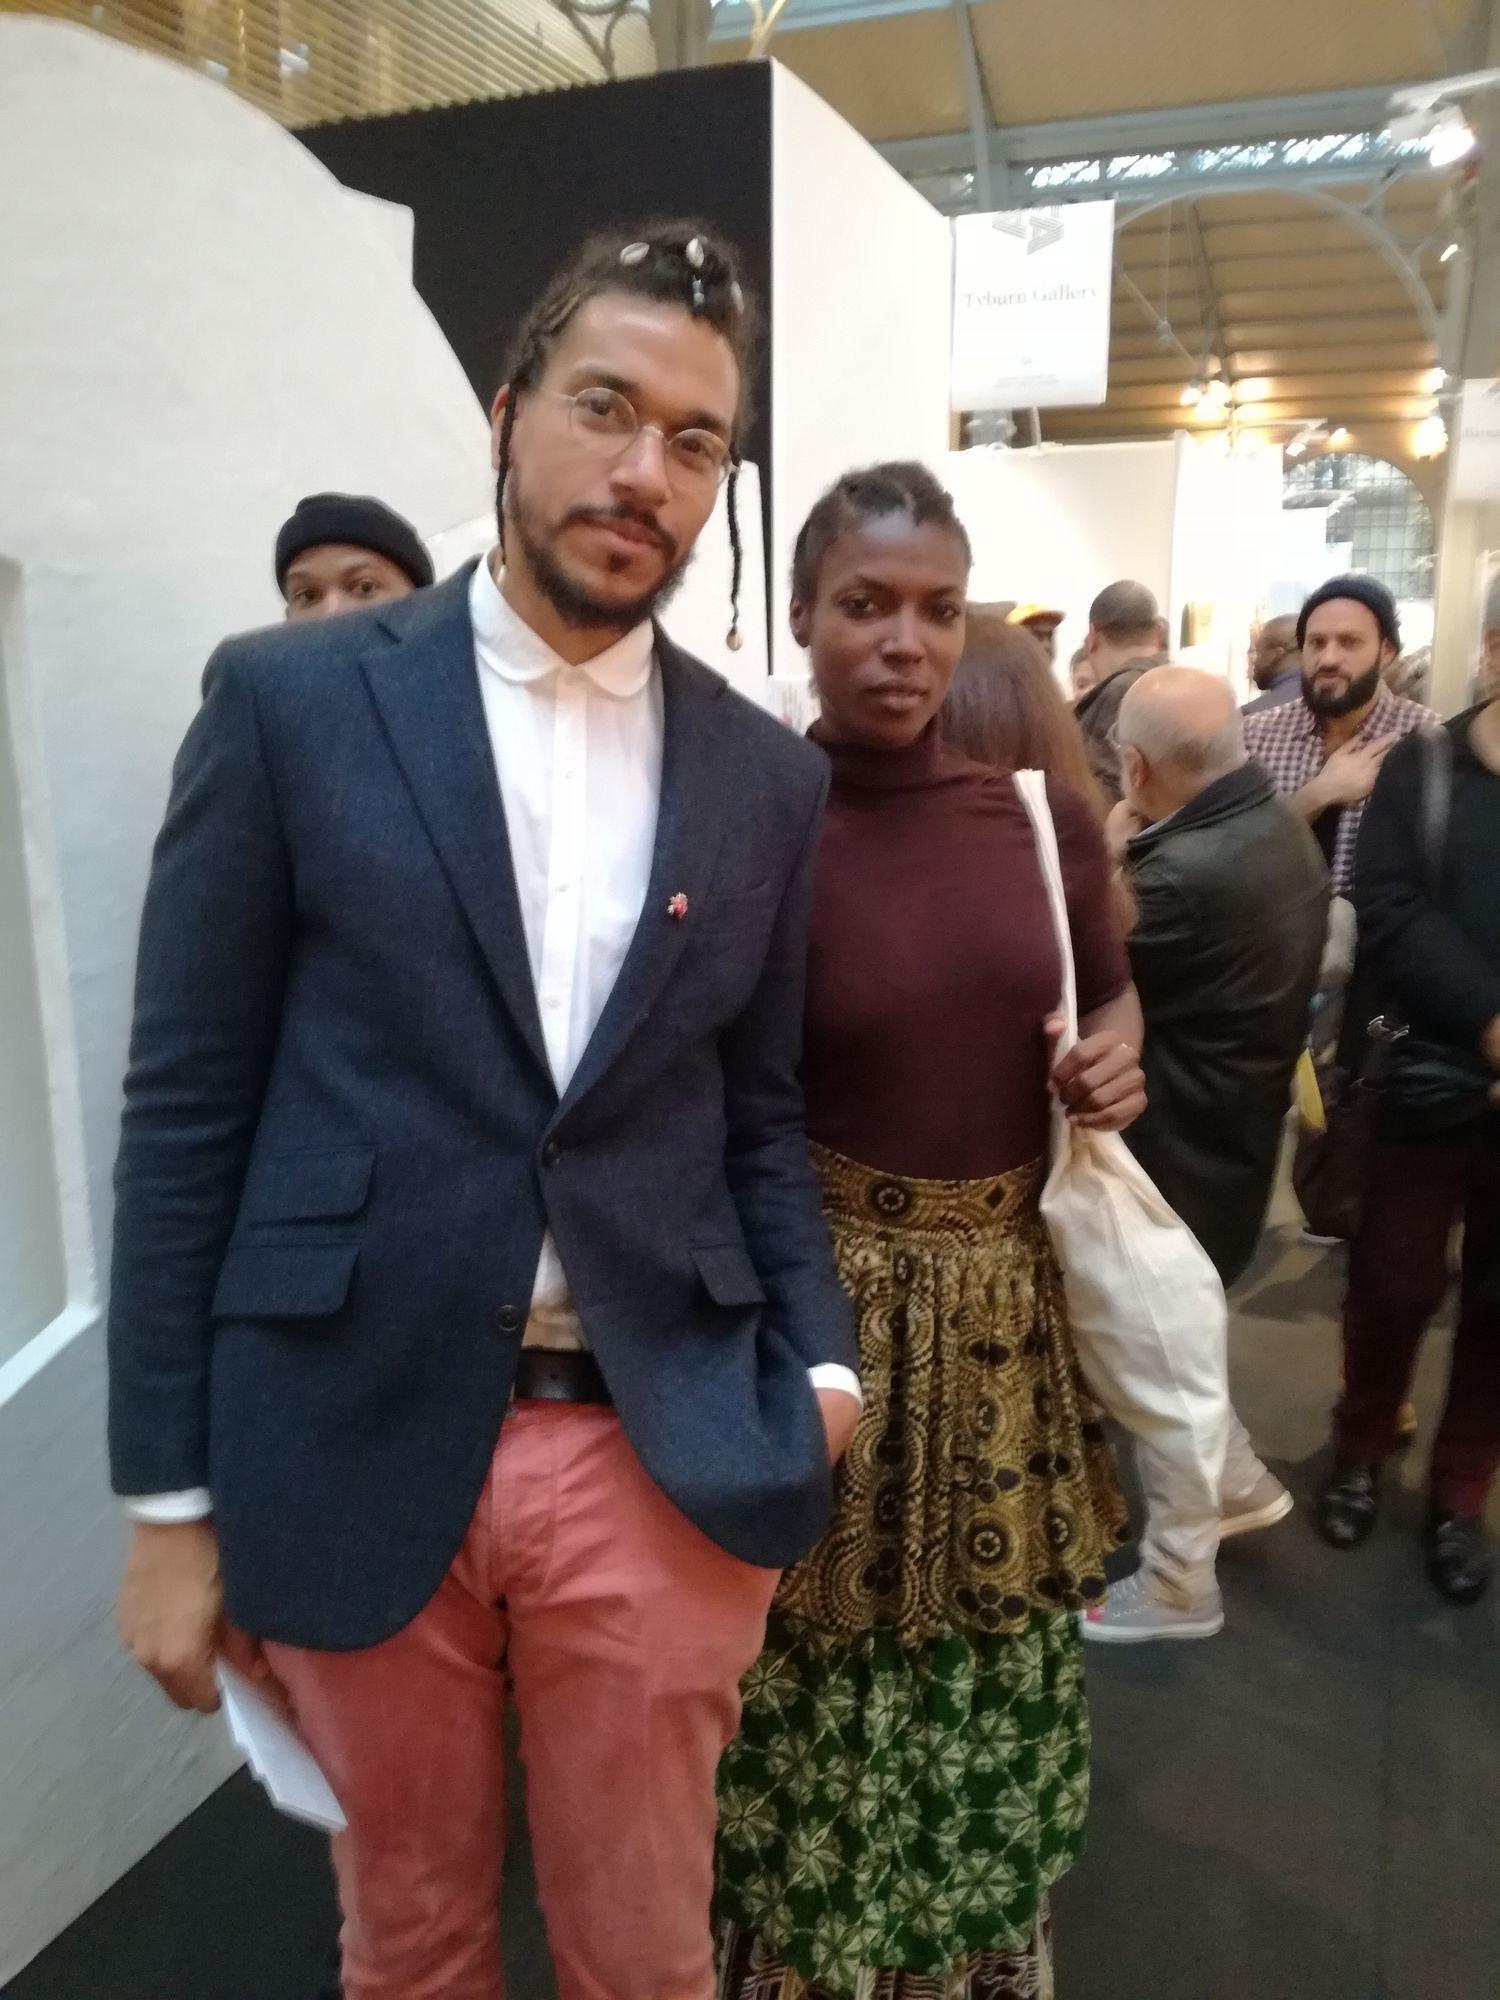 AKAA - Art & Design fair, Paris 10 - 12 November 2017,  Alexis Peskine